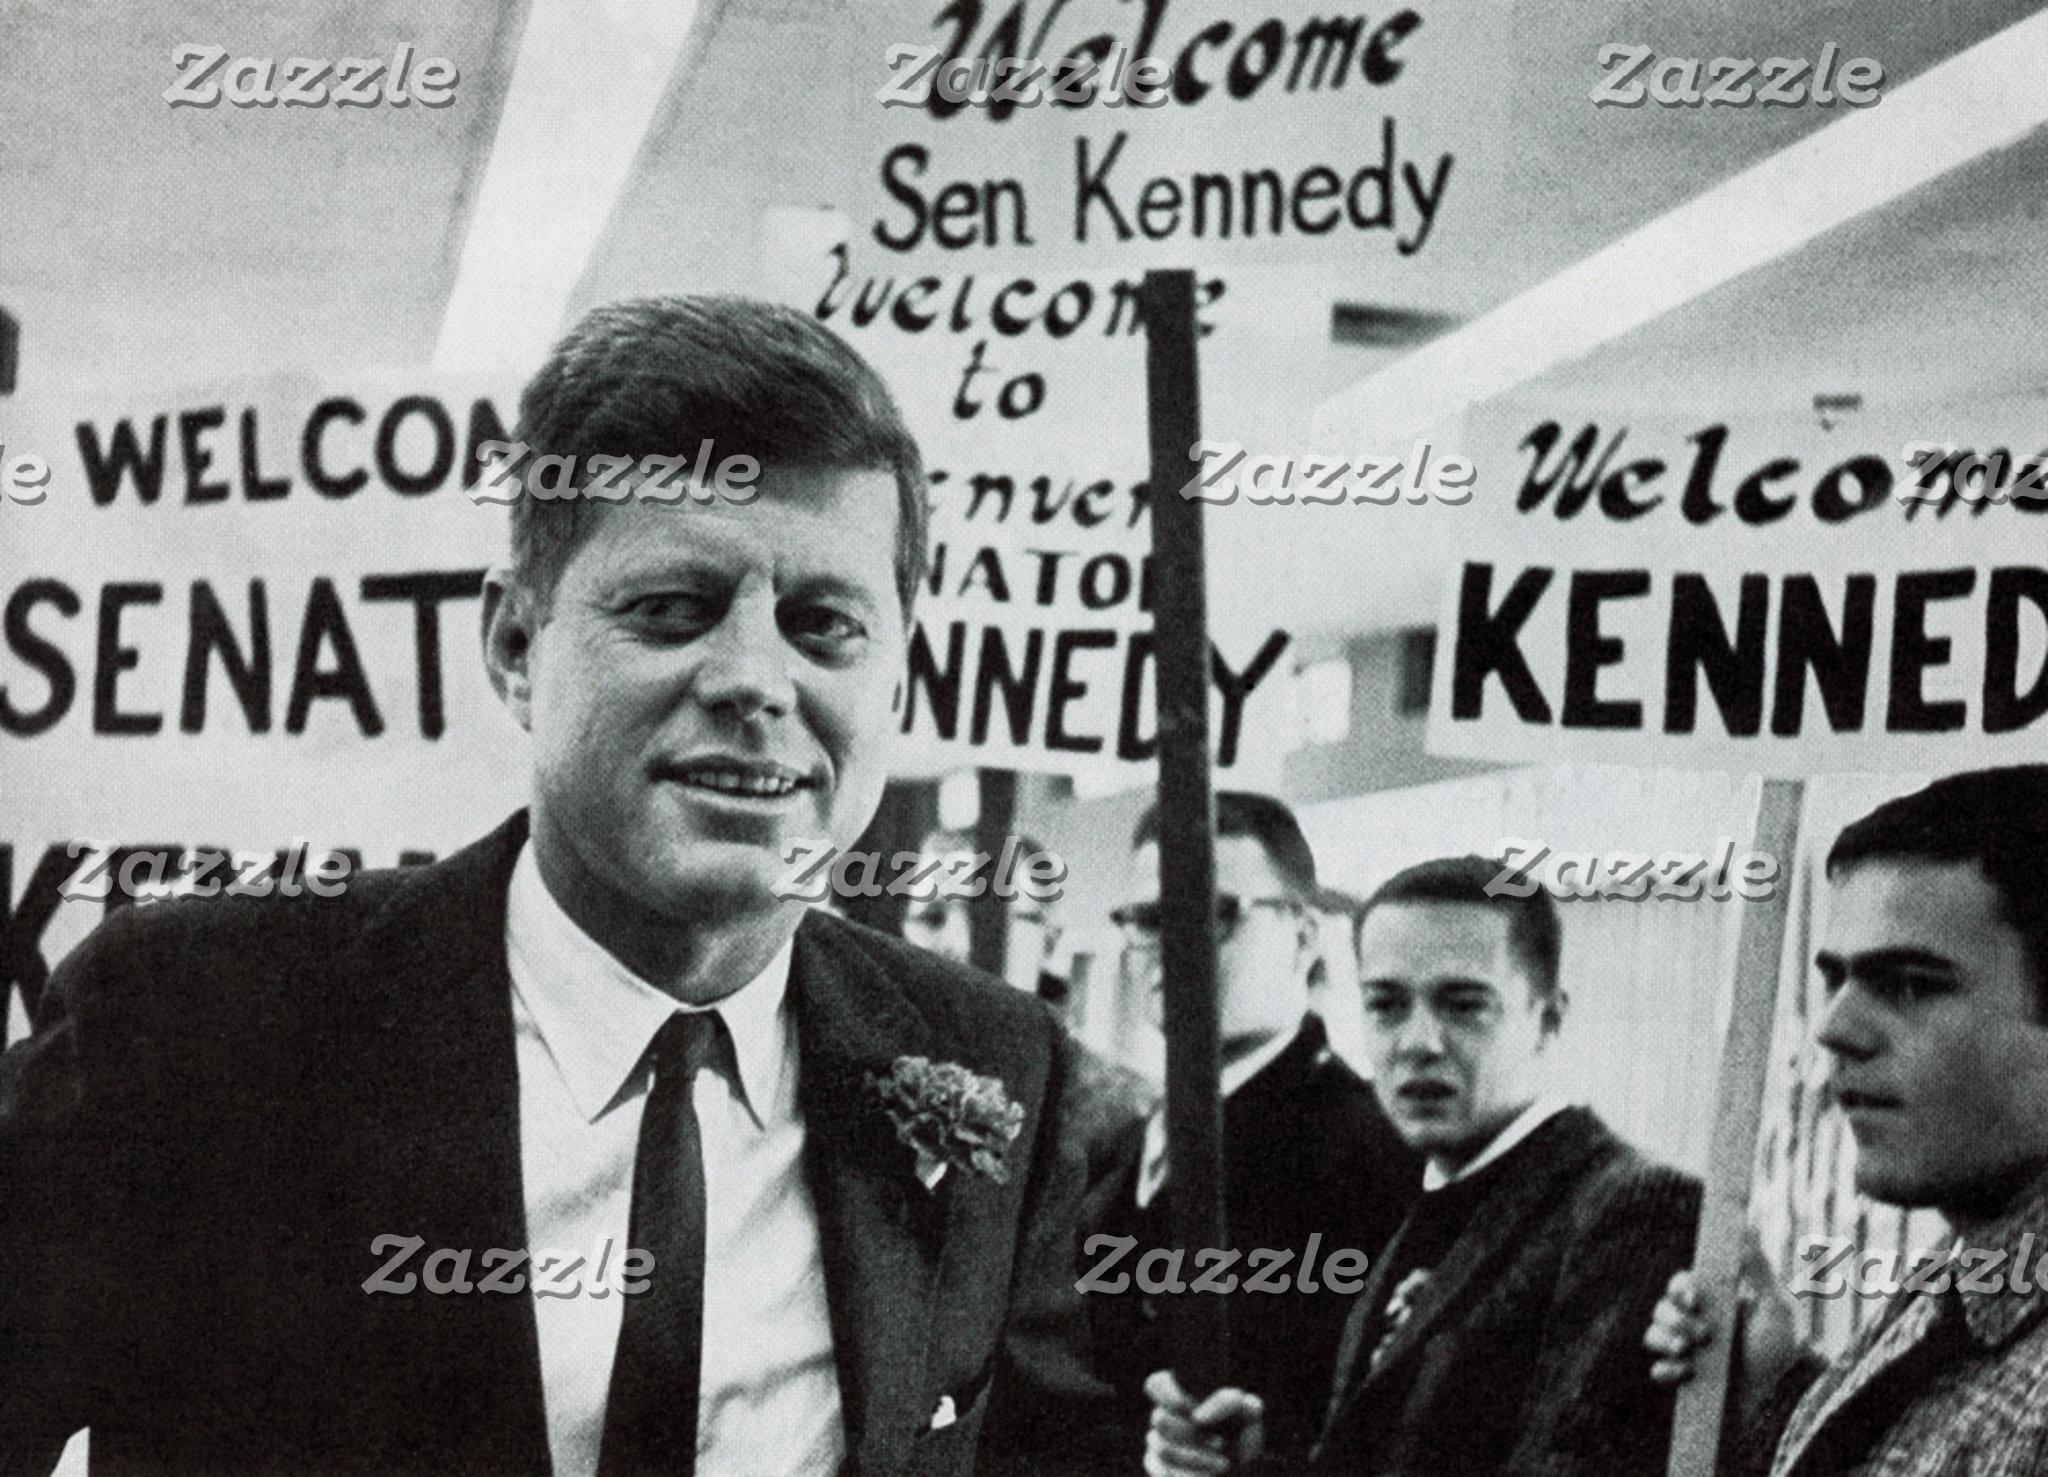 Candidate Kennedy